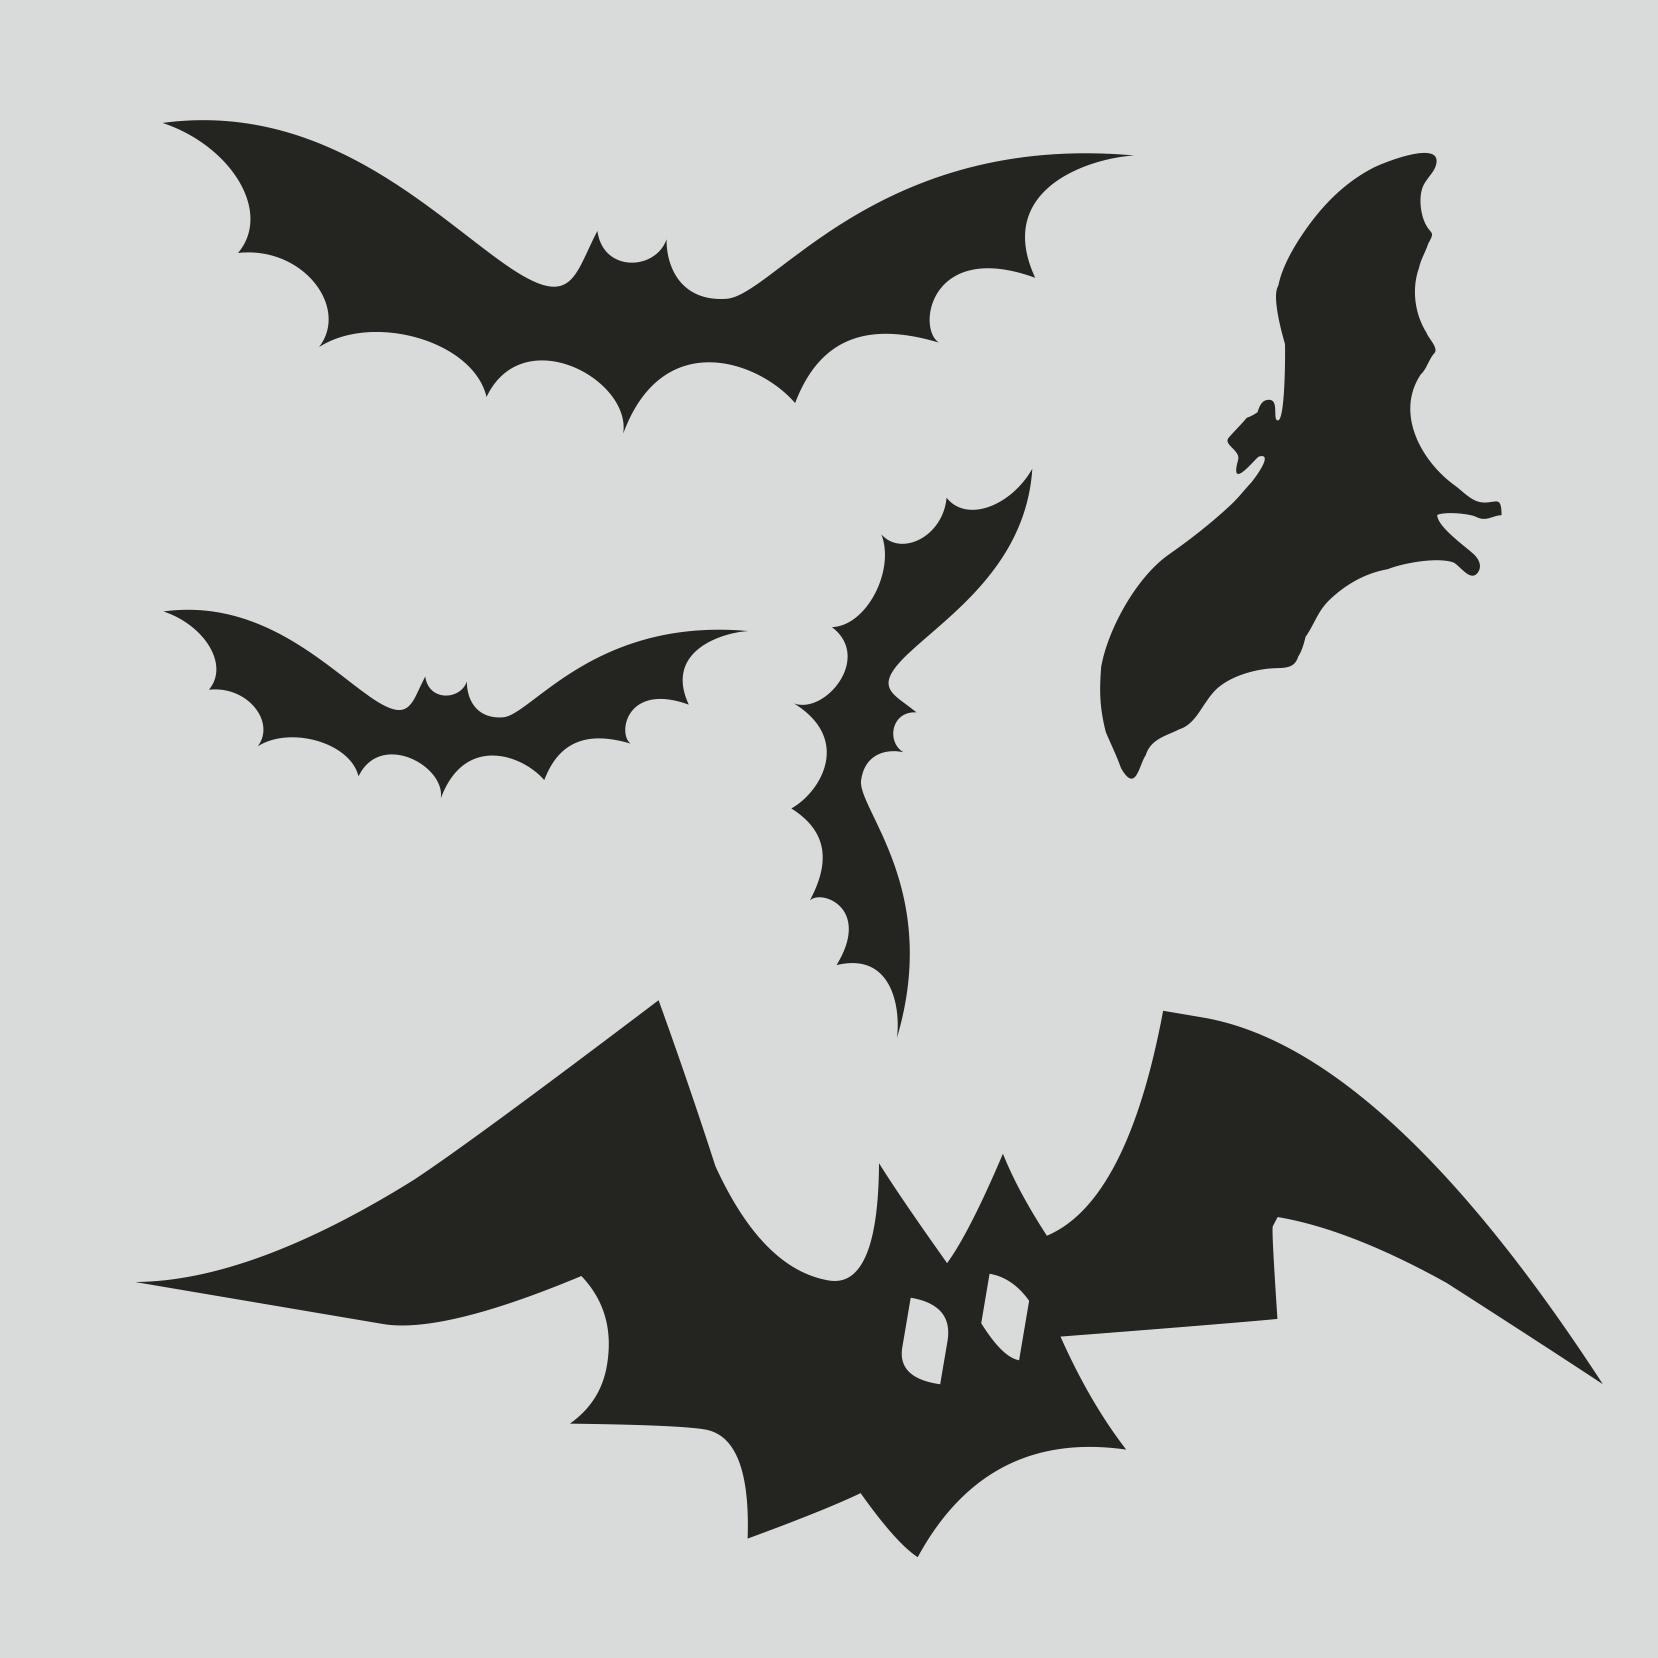 картинка летучей мыши для ерлянды на хелоуин для